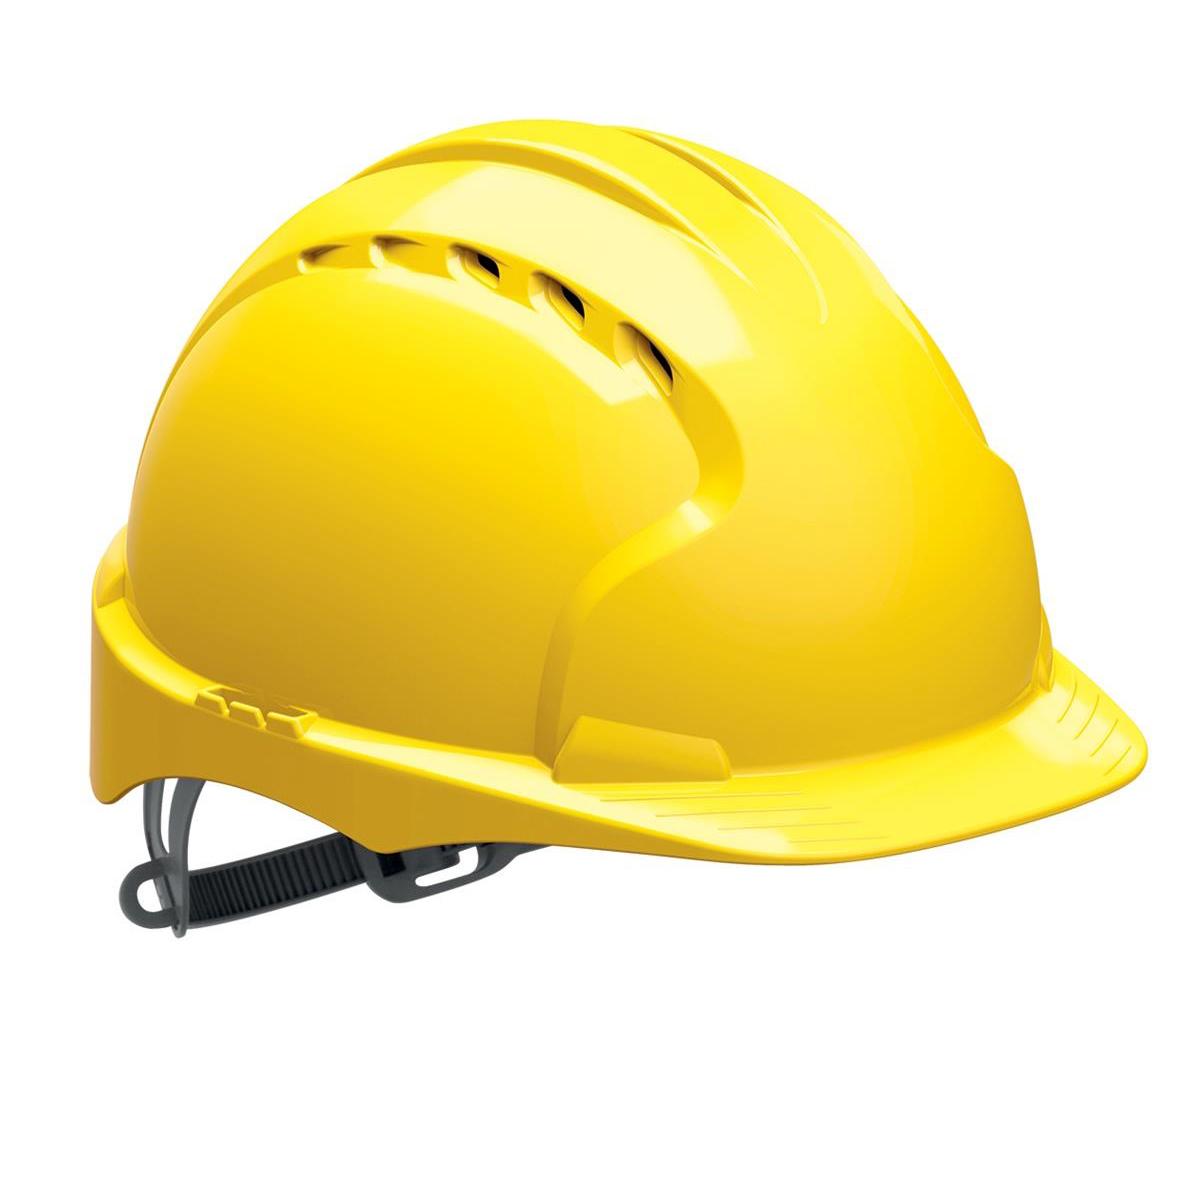 Head Protection JSP EVO2 Safety Helmet HDPE 6-point Polyethylene Harness EN397 Standard Yellow Ref AJF030-000-200